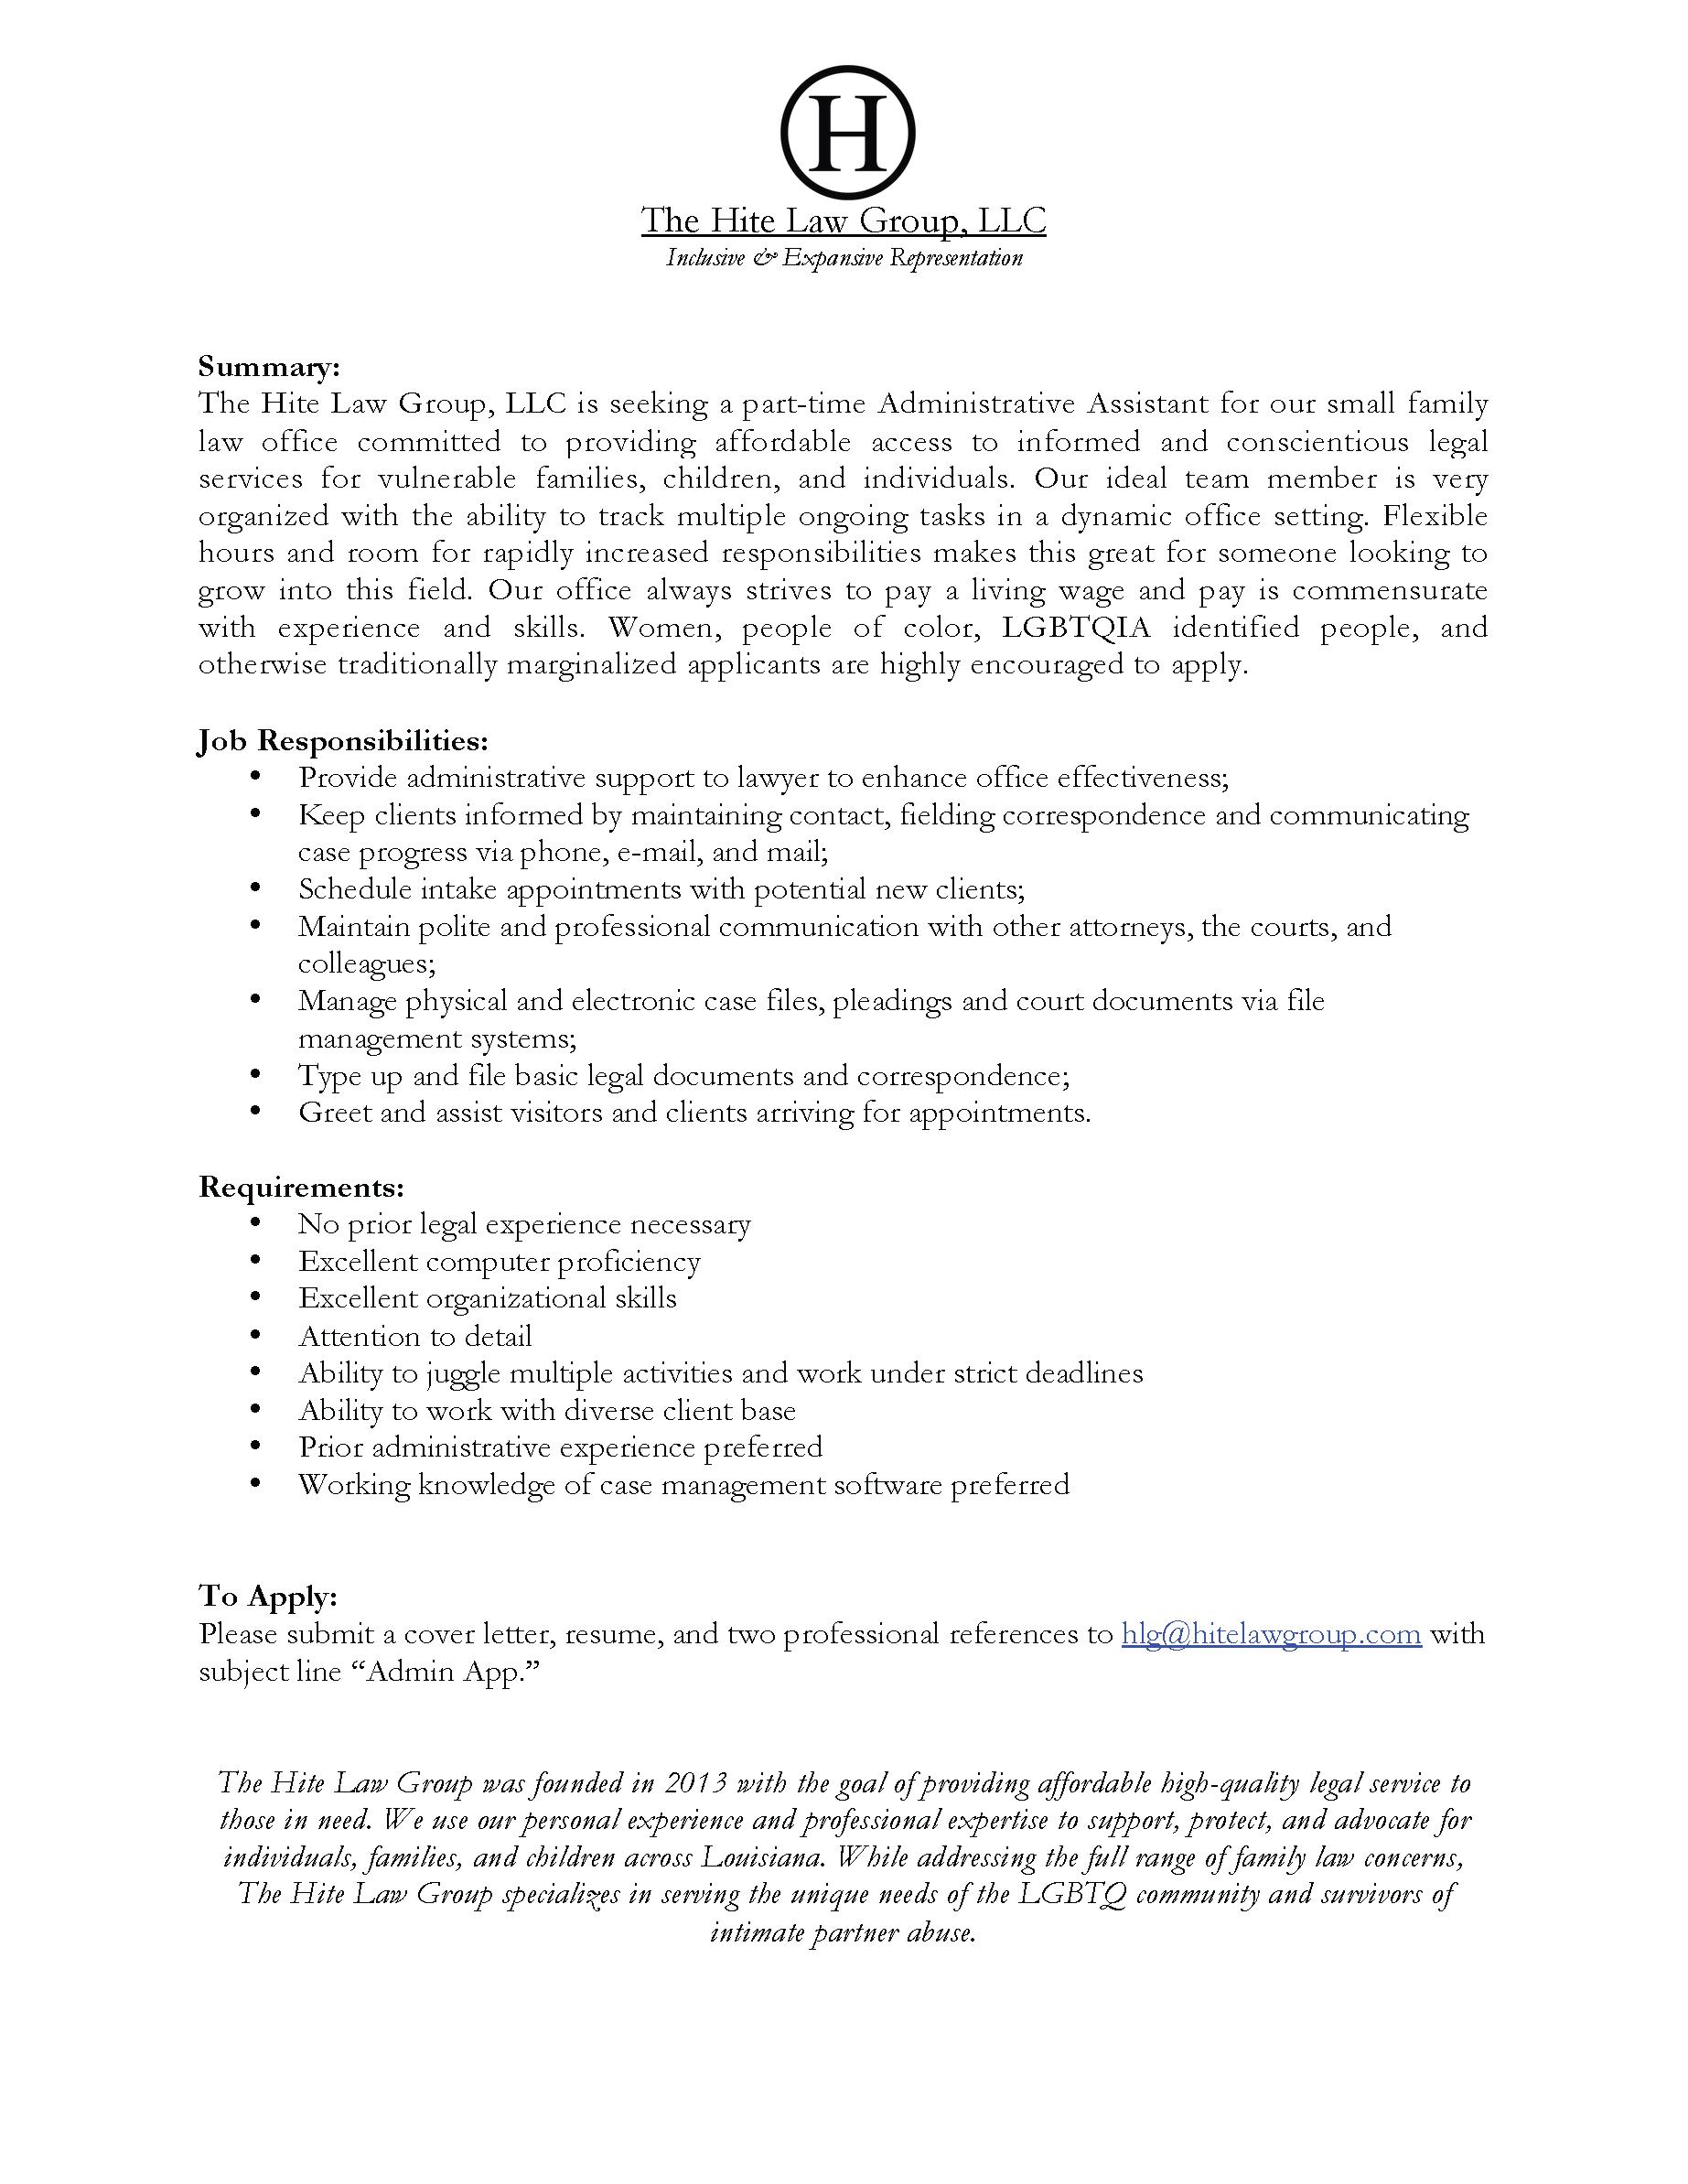 HLG+Job.png